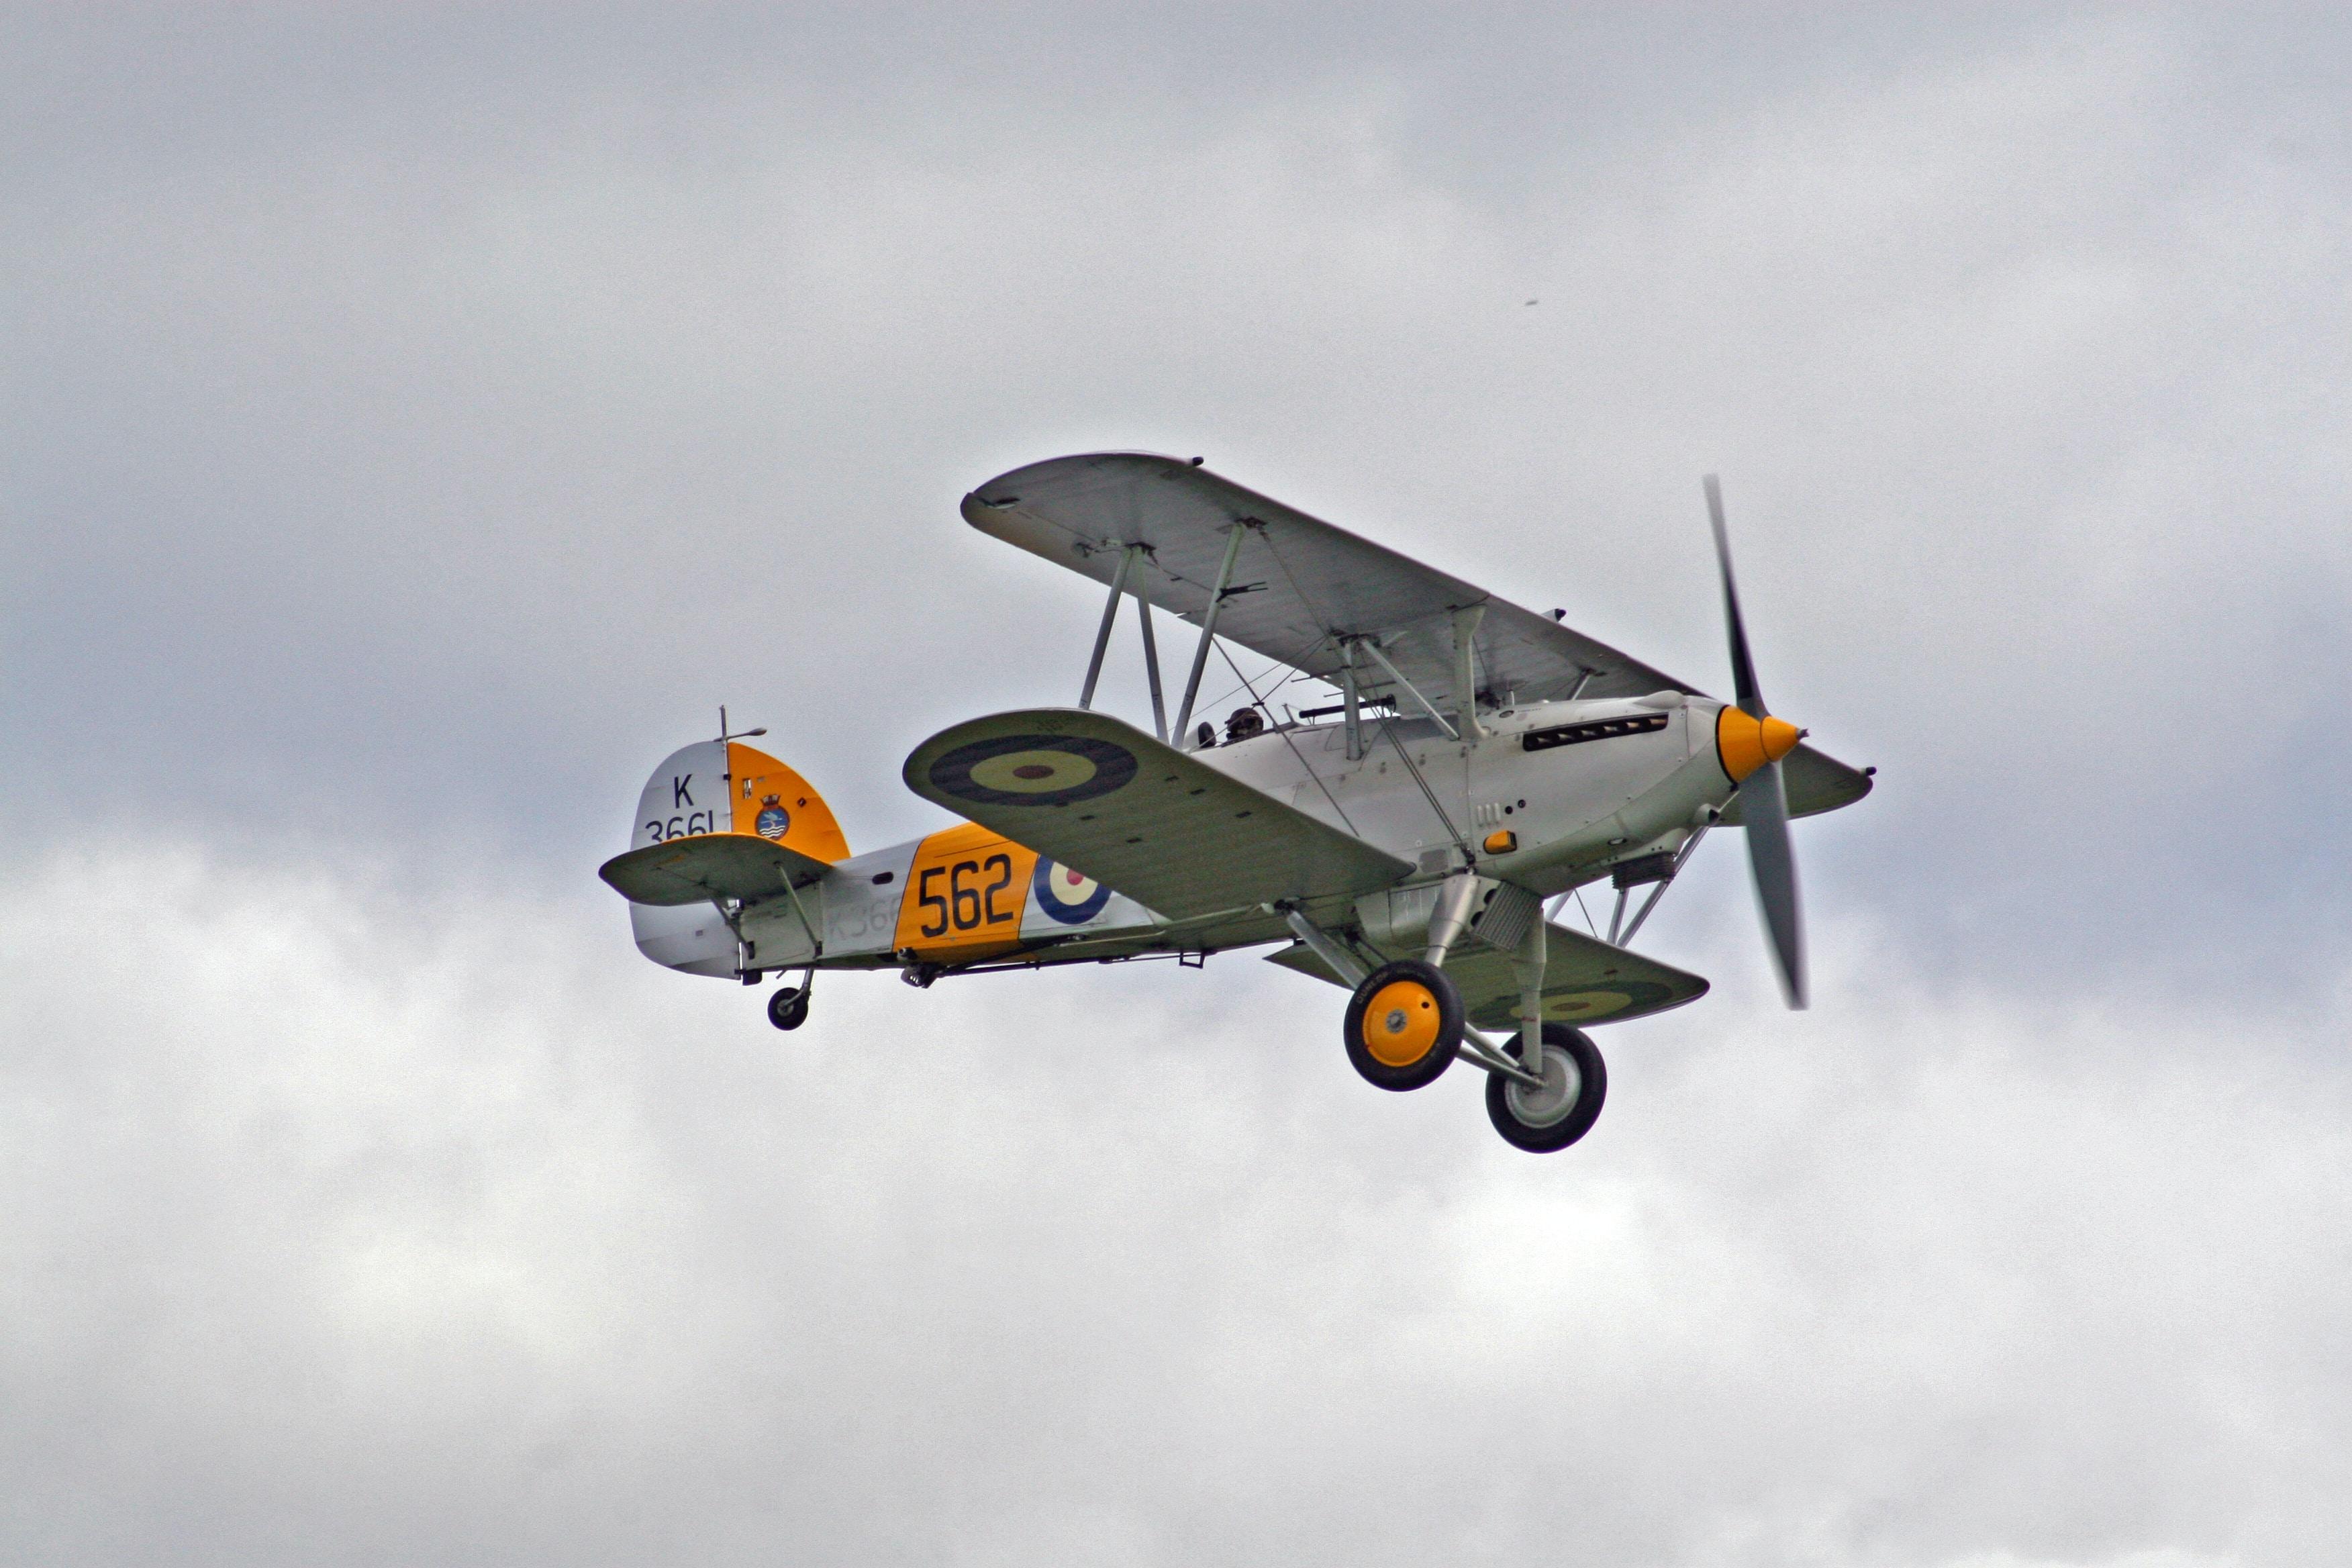 white and orange bi-plane in mid air